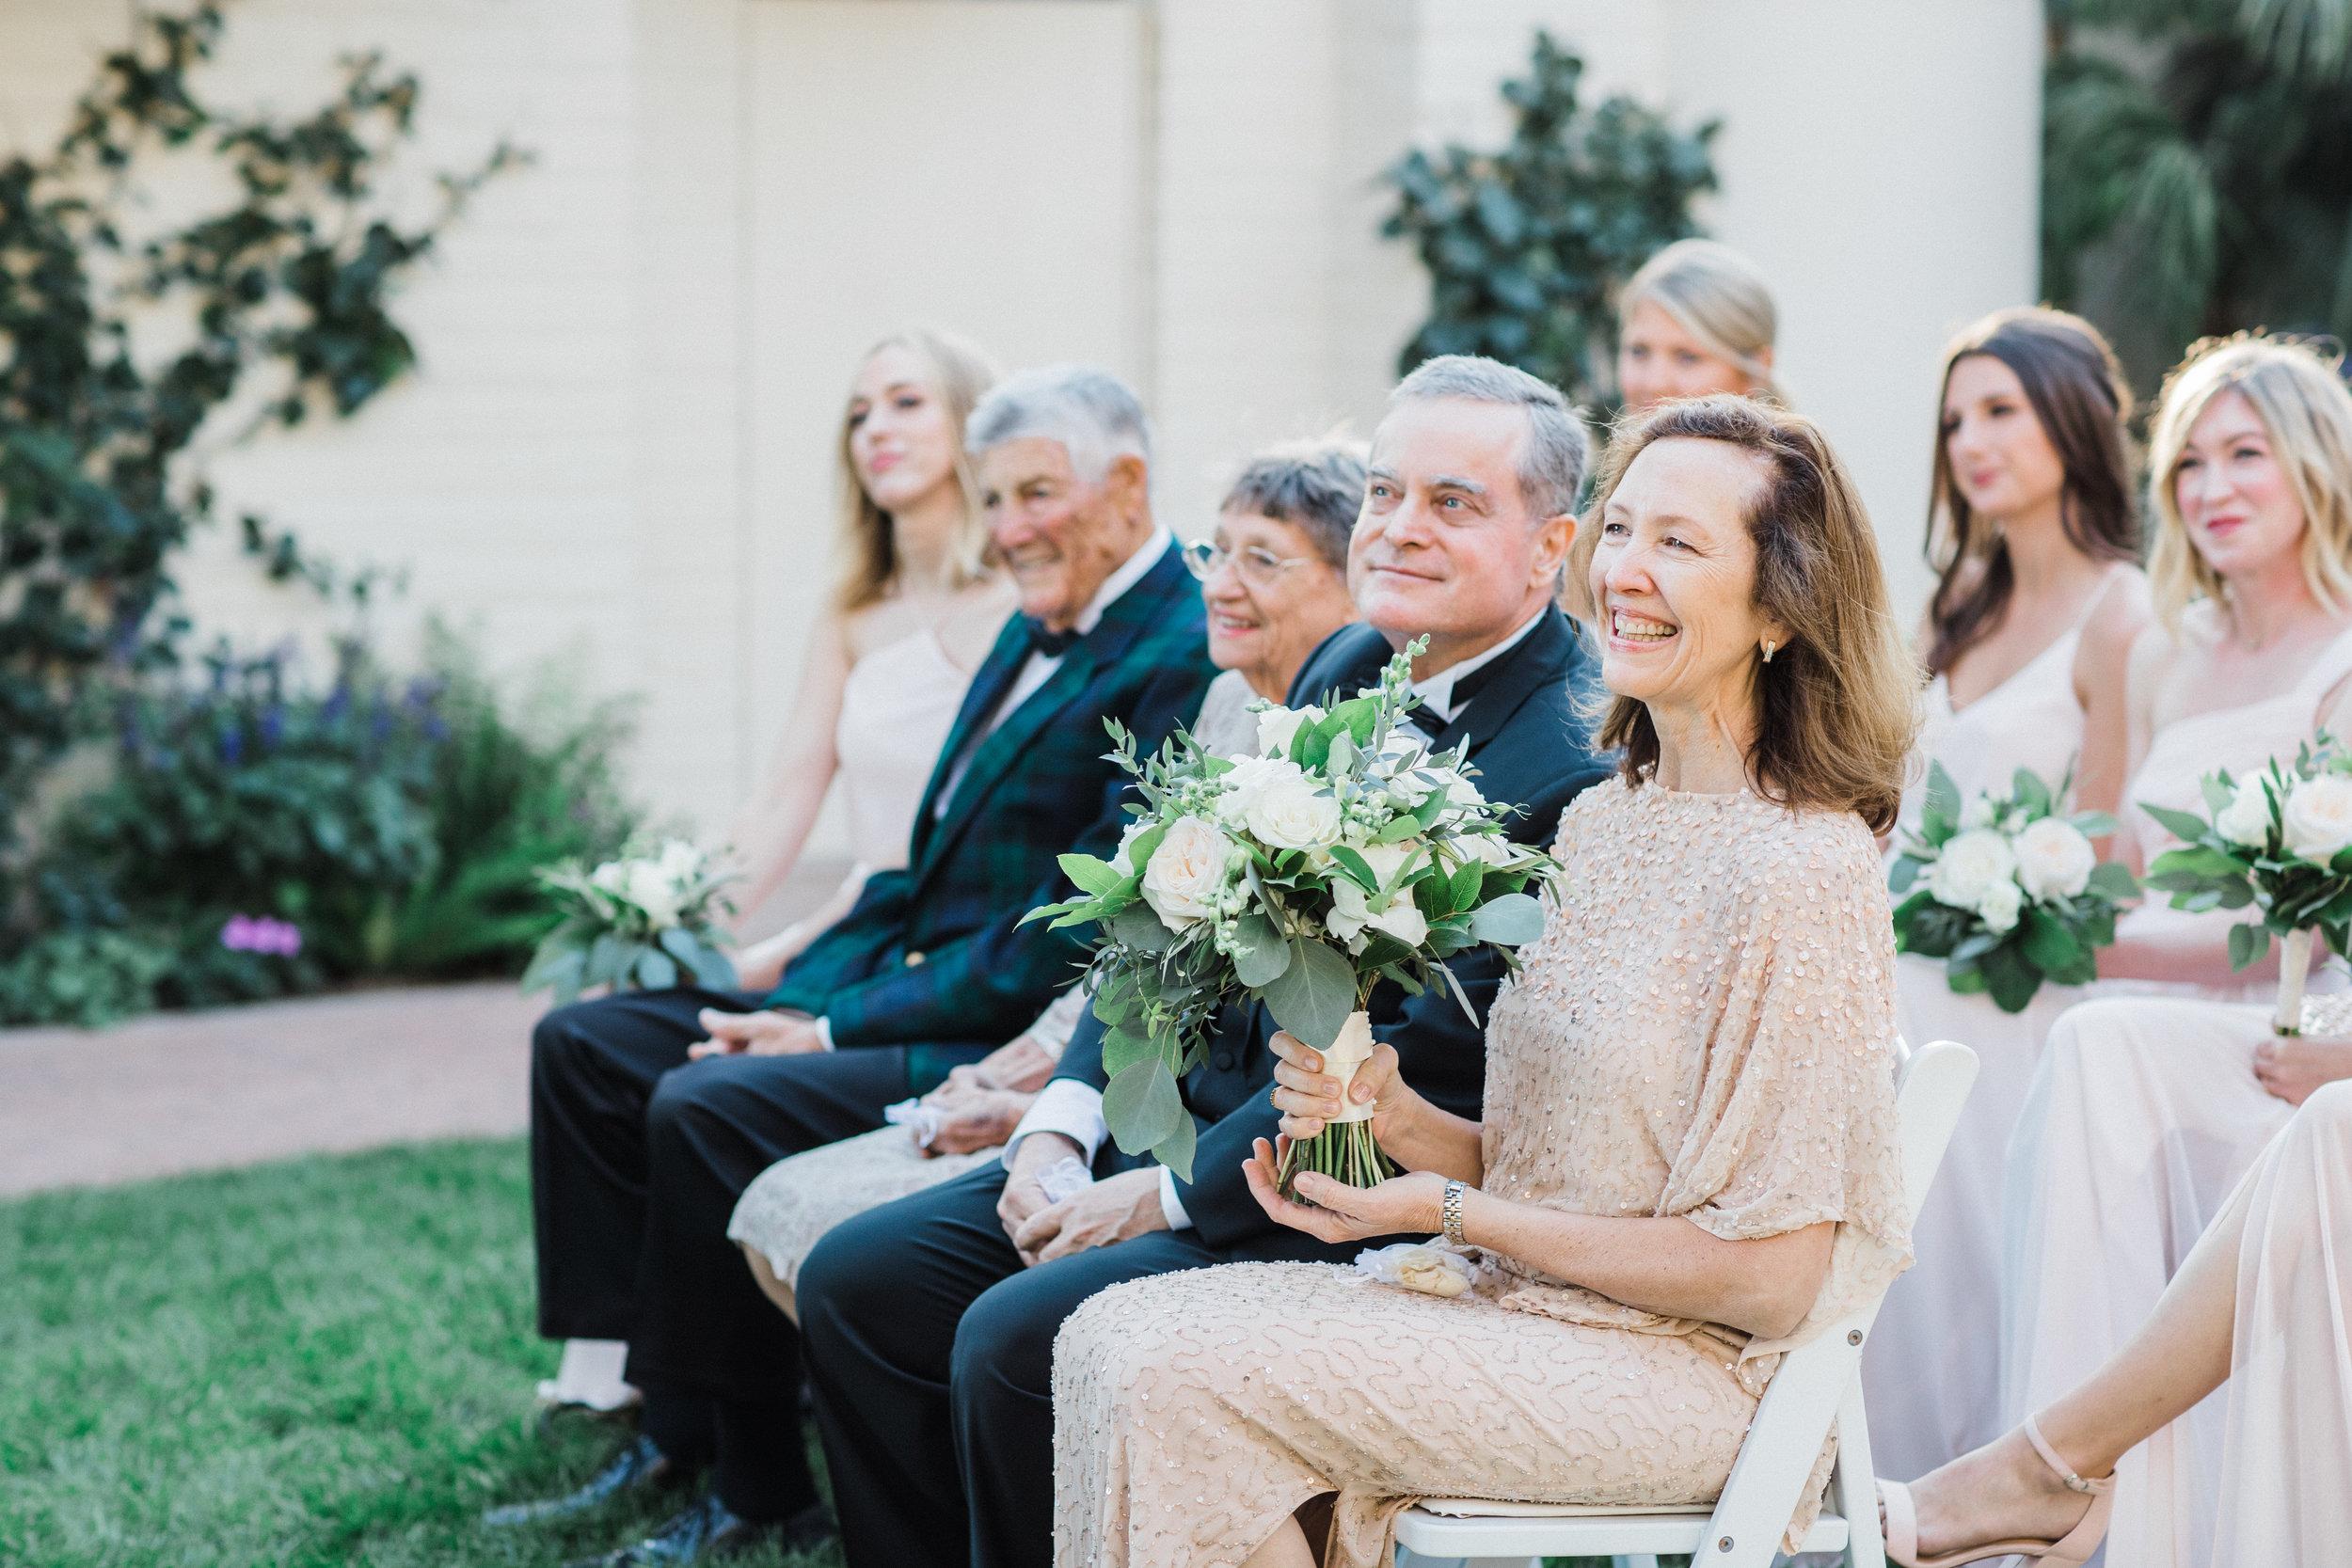 www.santabarbarawedding.com | KB Events | Michael and Anna Costa | Four Seasons The Biltmore | Ceremony